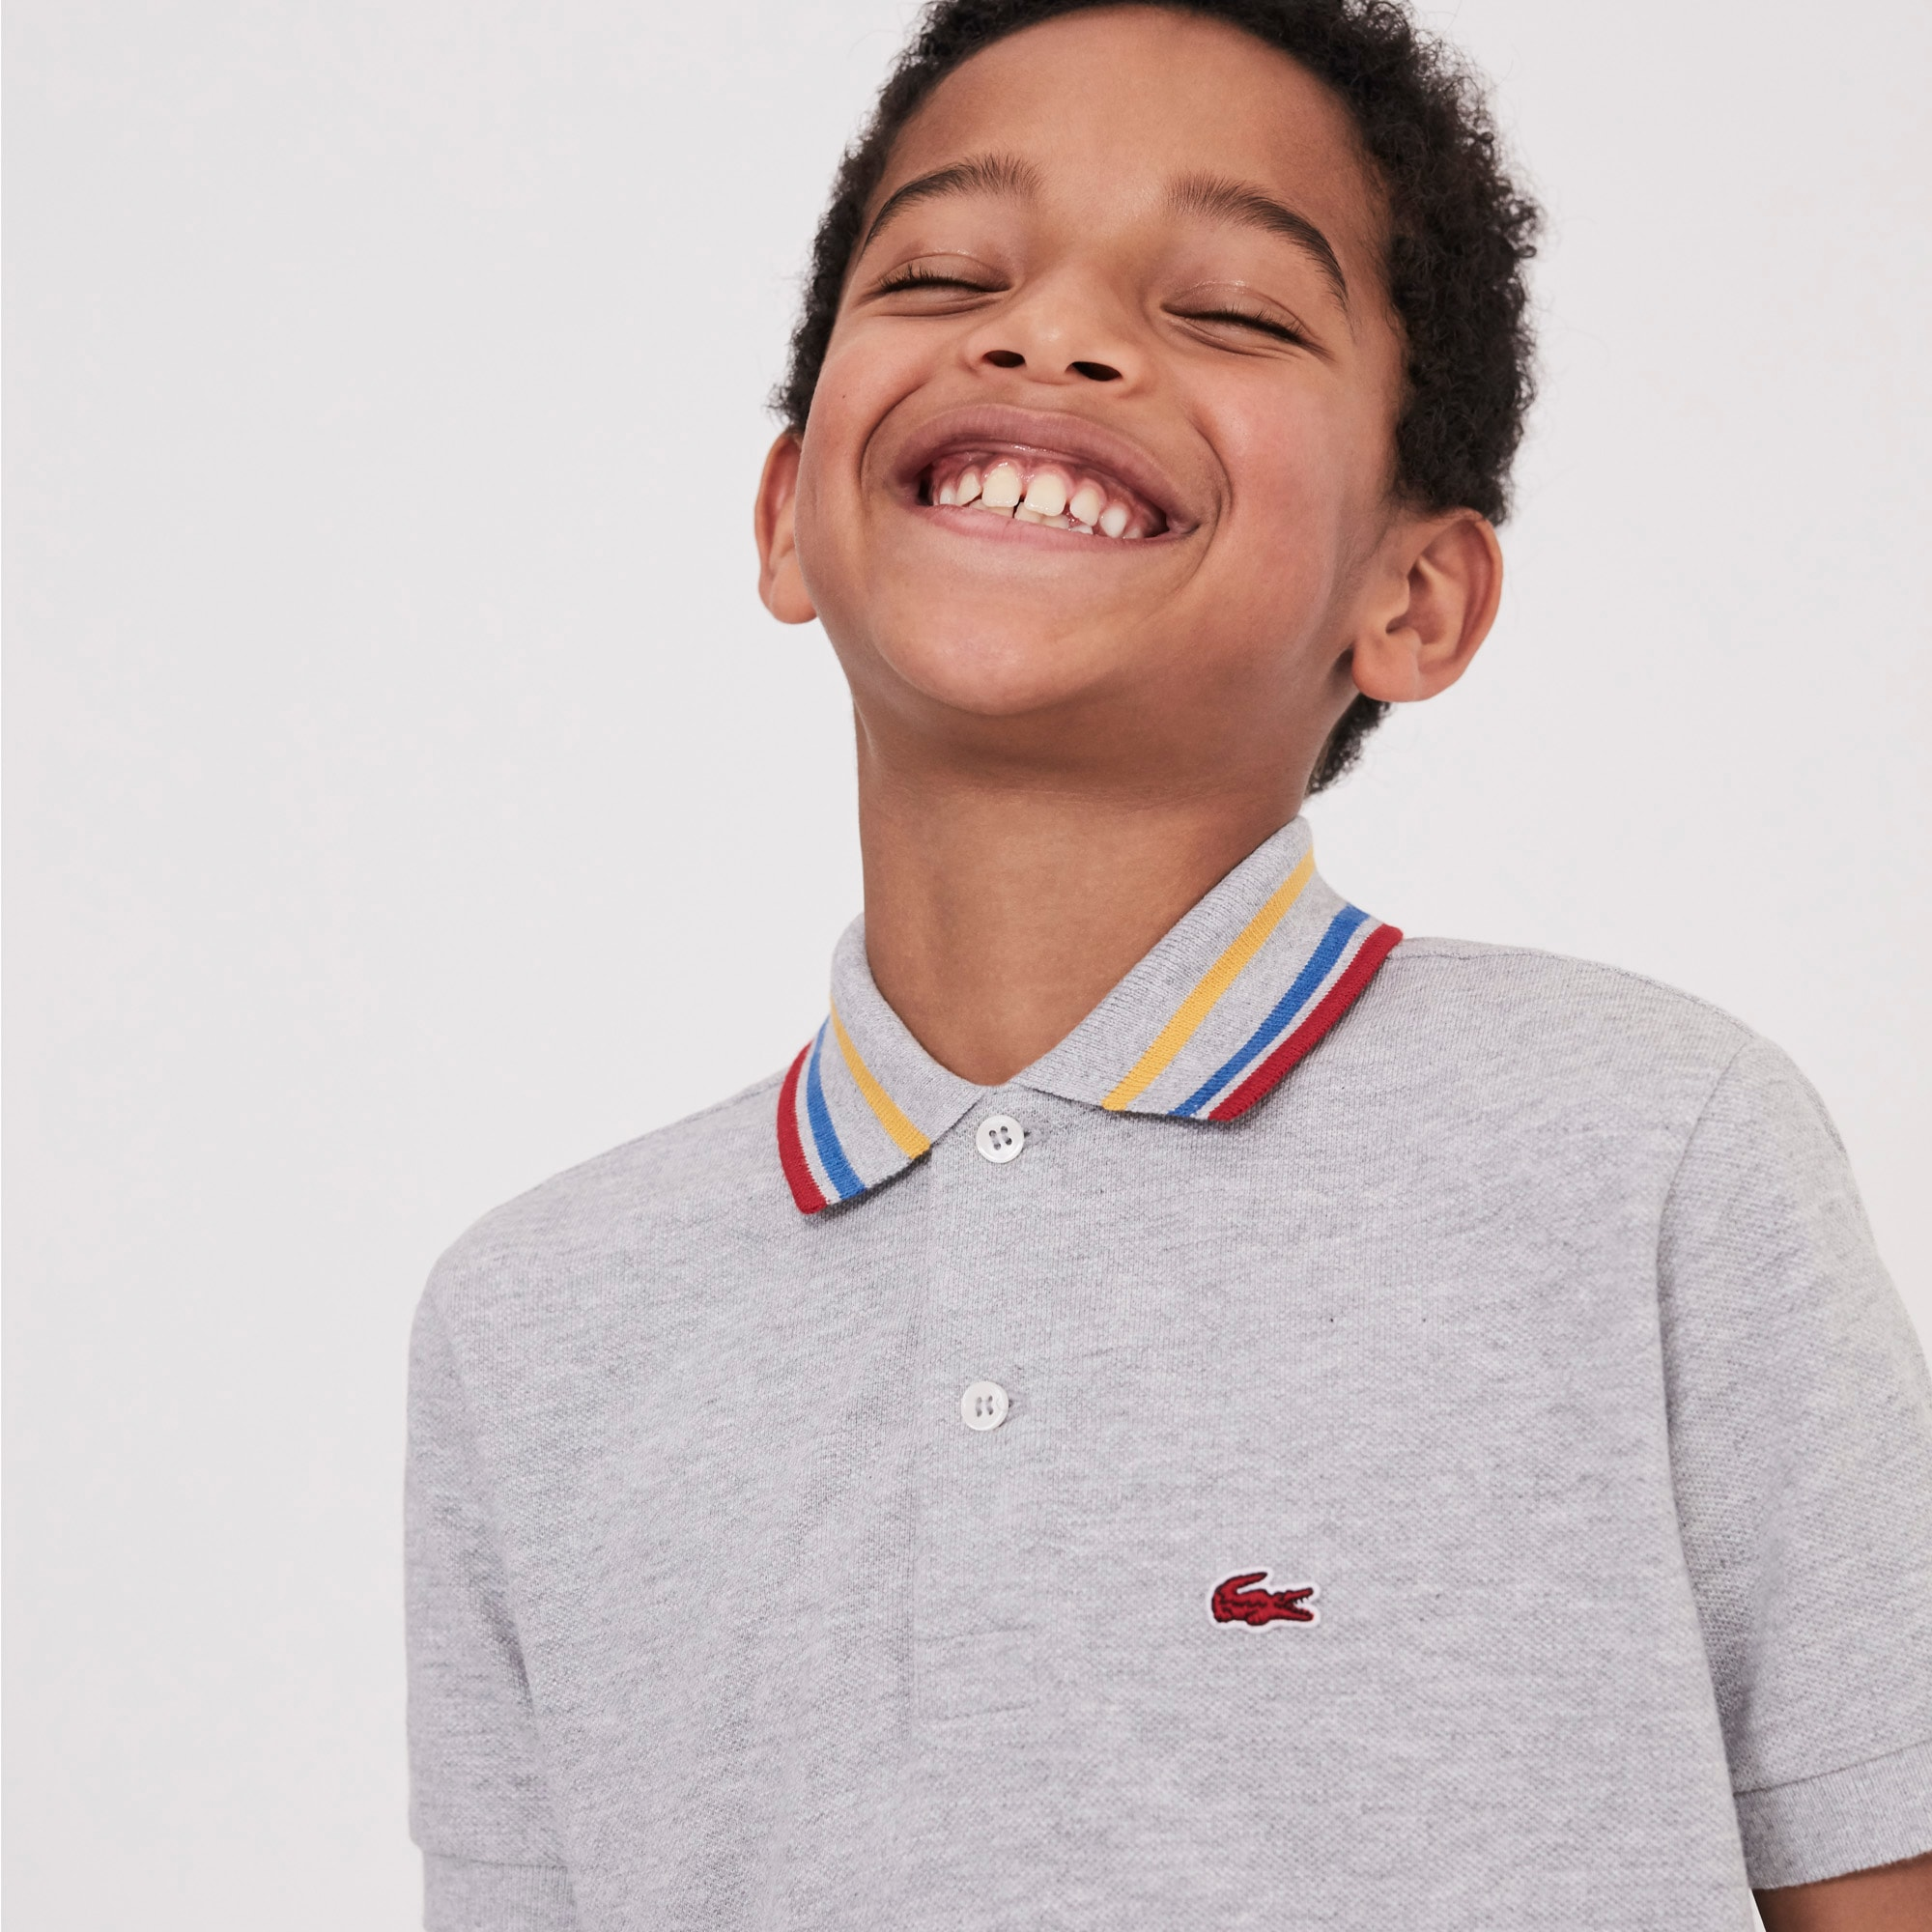 Jungen LACOSTE Poloshirt aus Petit Piqué mit gestreiftem Kragen